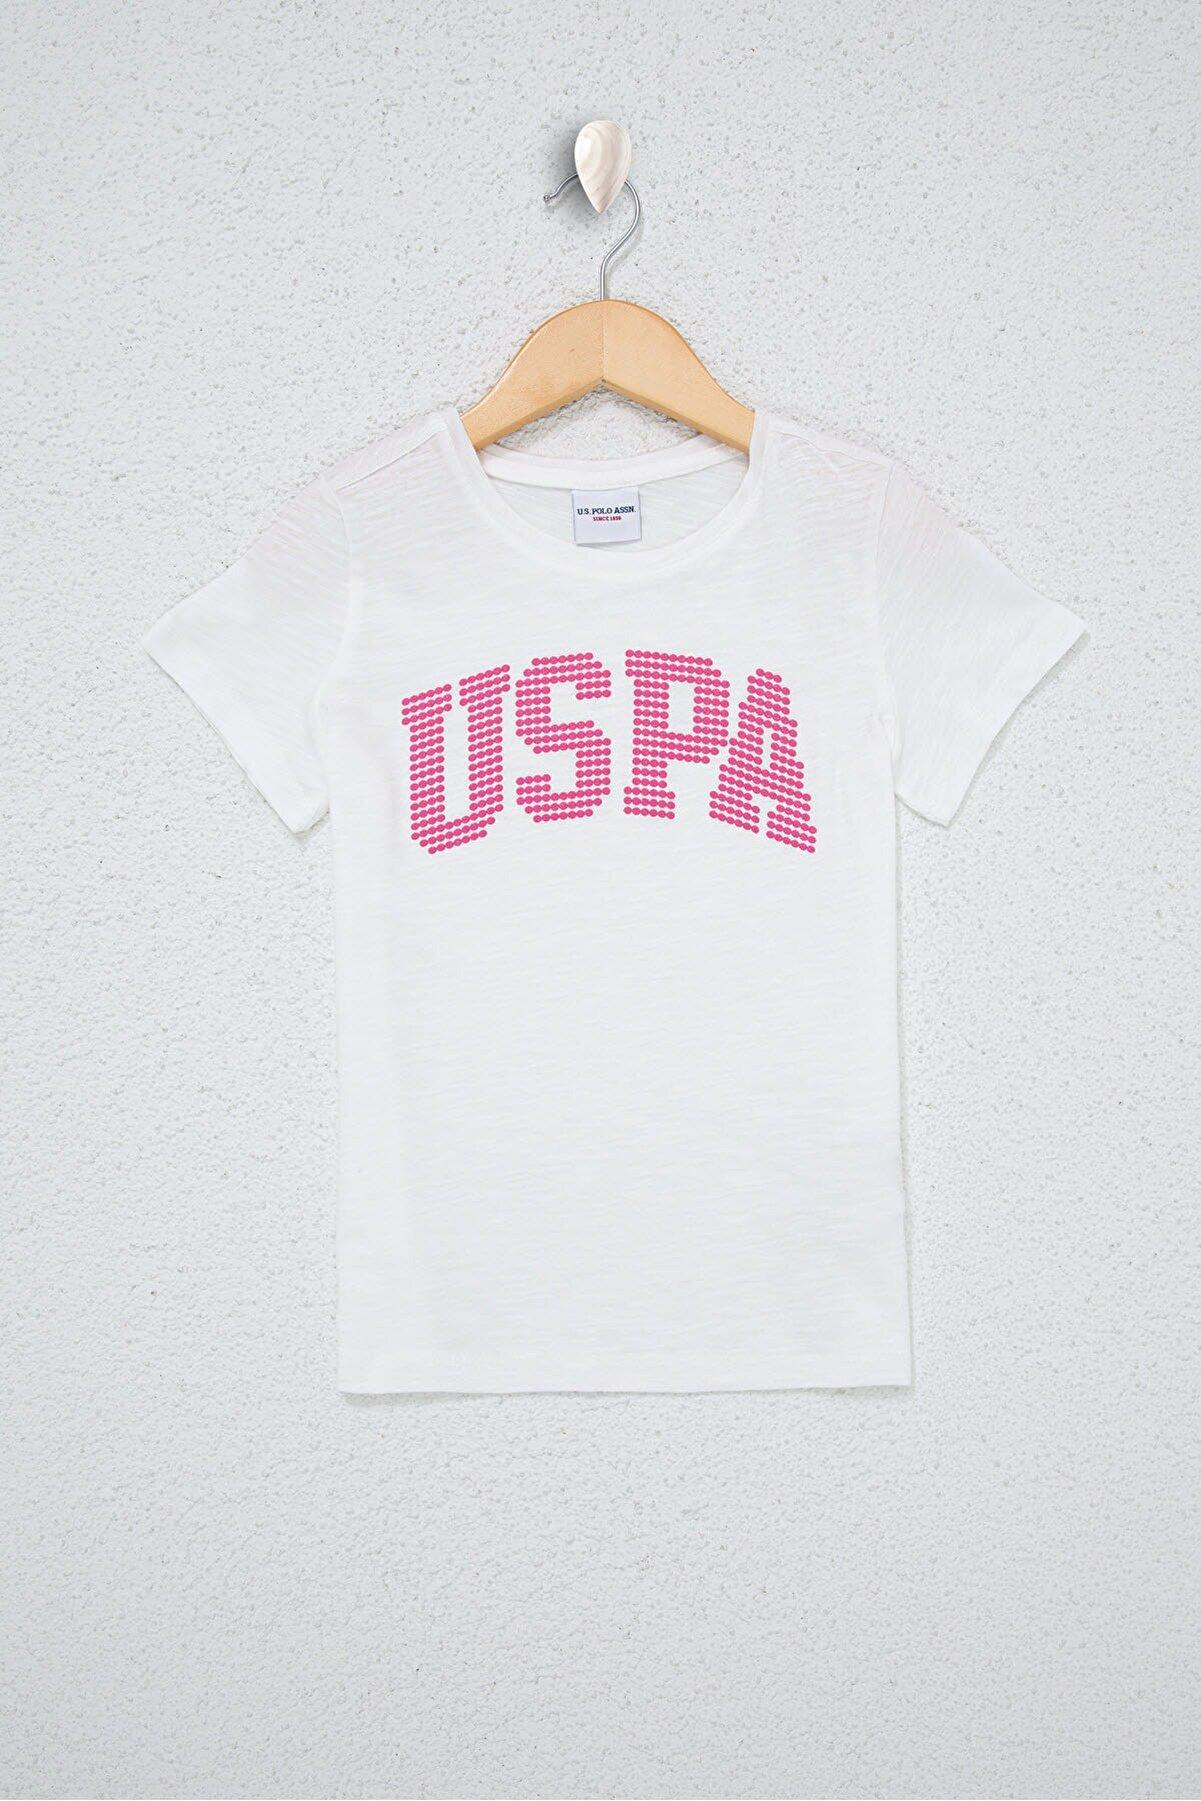 US Polo Assn Beyaz Kız Çocuk T-Shirt